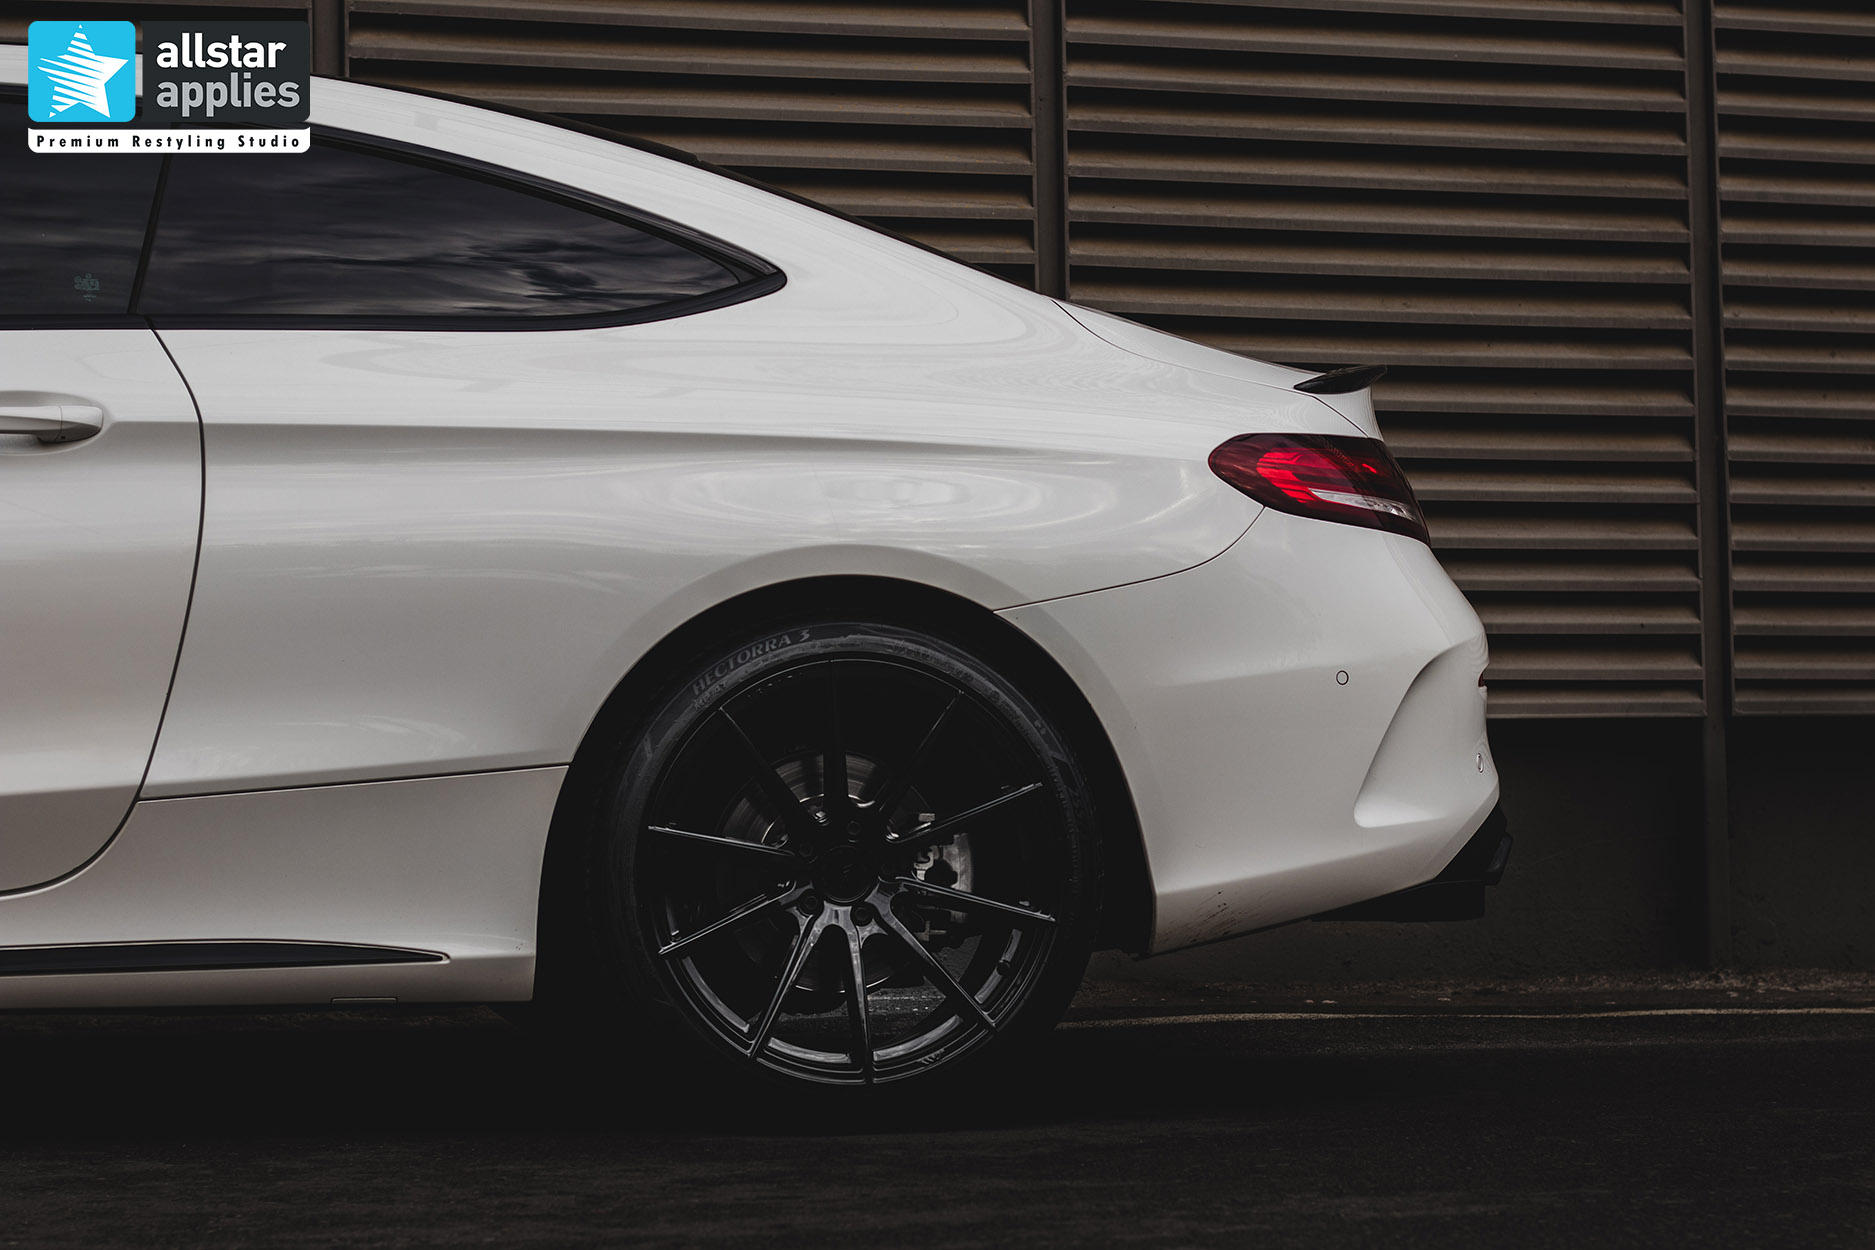 mercedes-benz c coupe ispiri ffr1 3